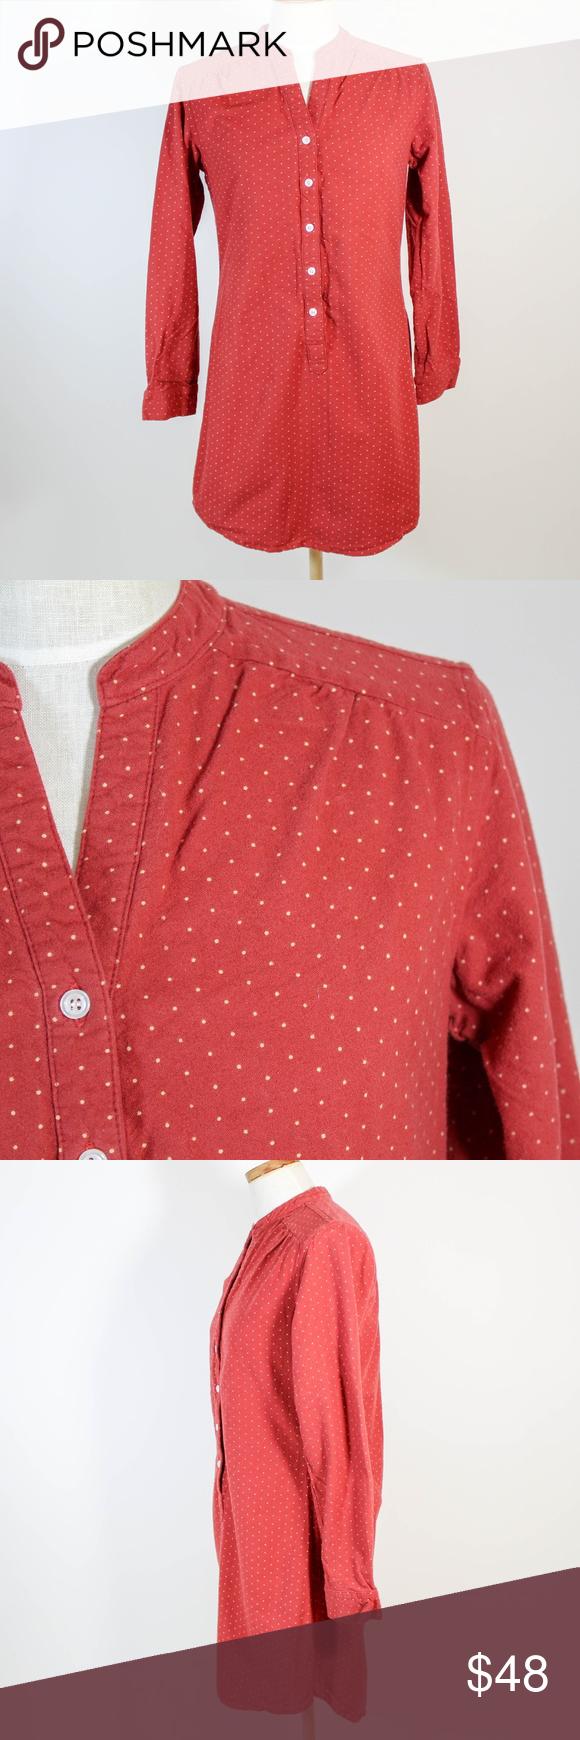 Bridge and burn red polka dot shirt dress flannel darkish red